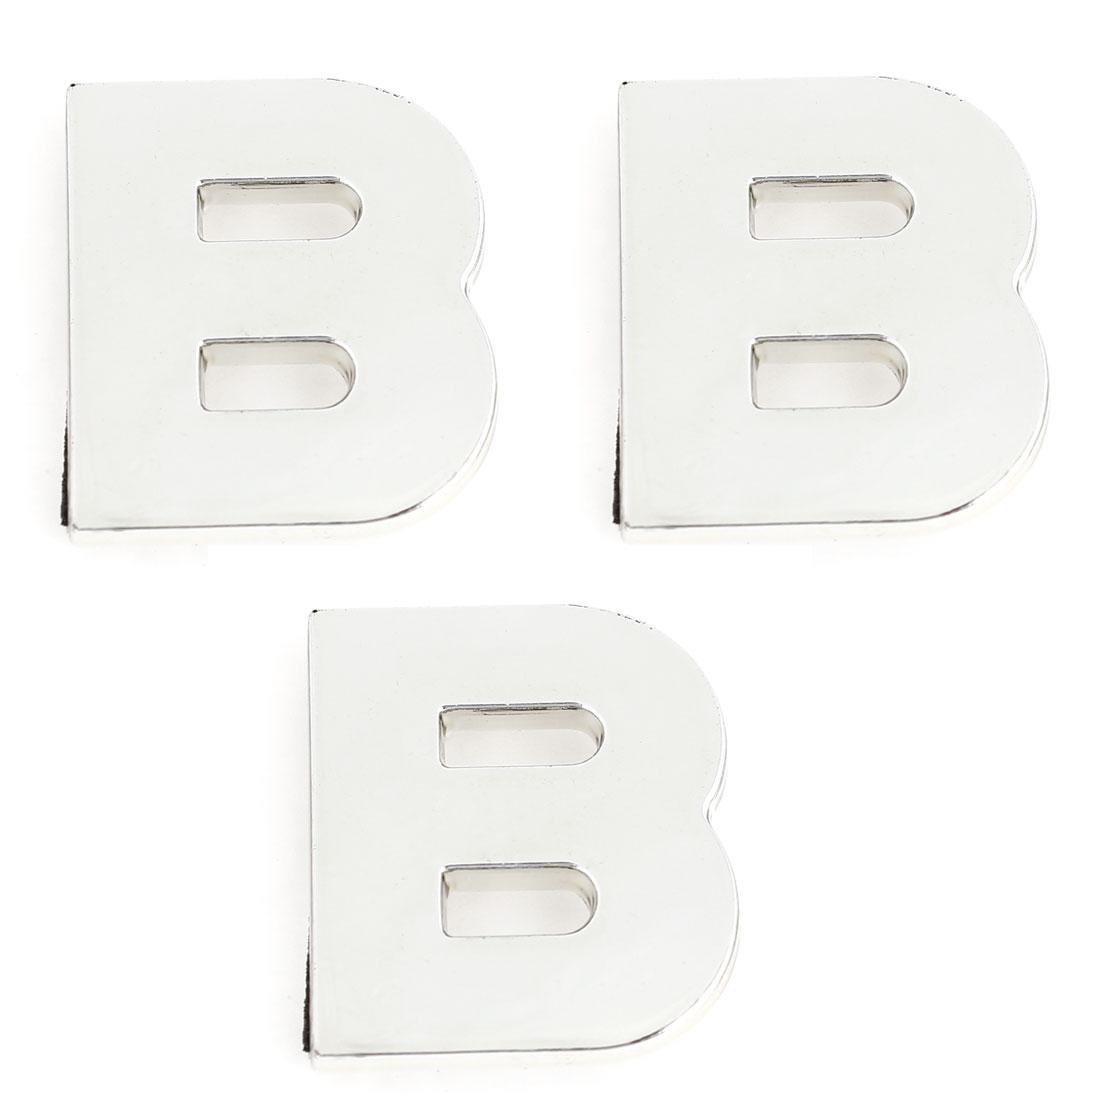 Car Plastic English Letter B Shape Emblem Stickers Decoration Silver Tone 3 Pcs